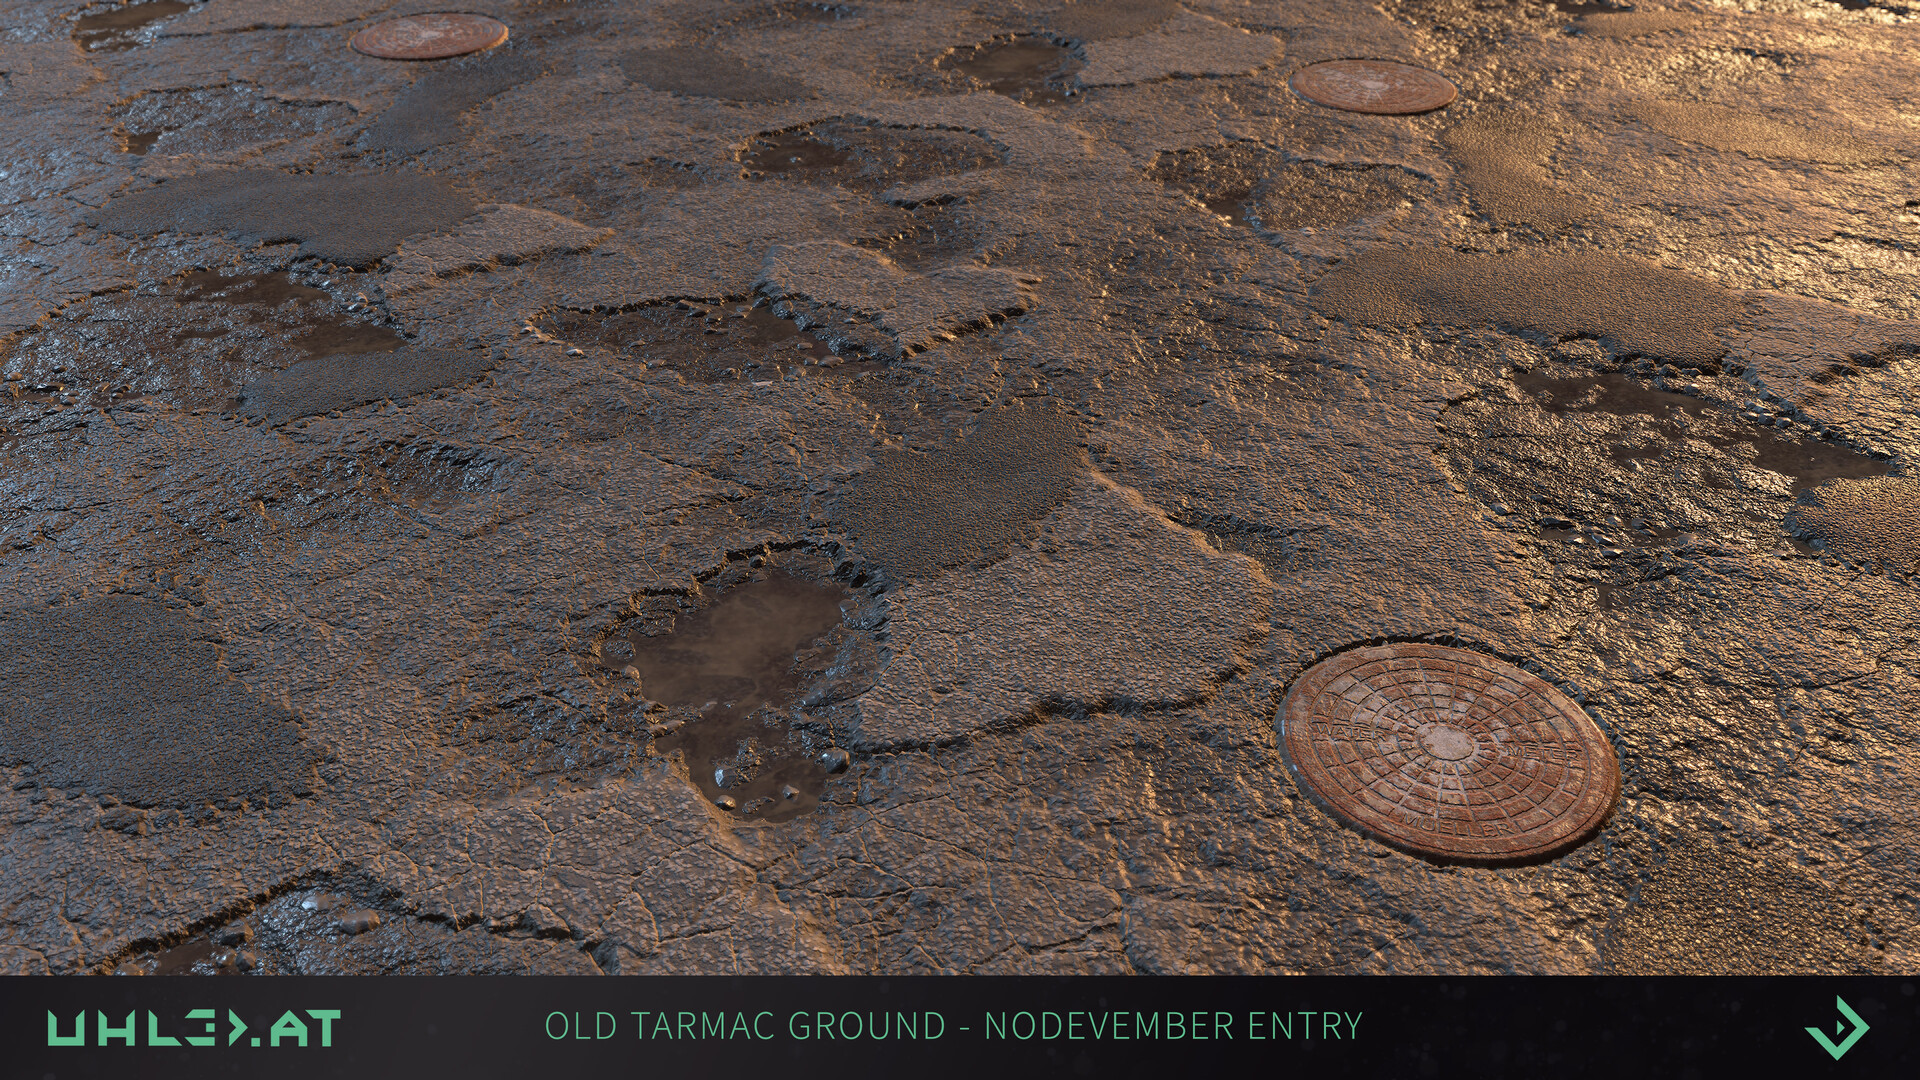 Dominik uhl old tarmac ground 06